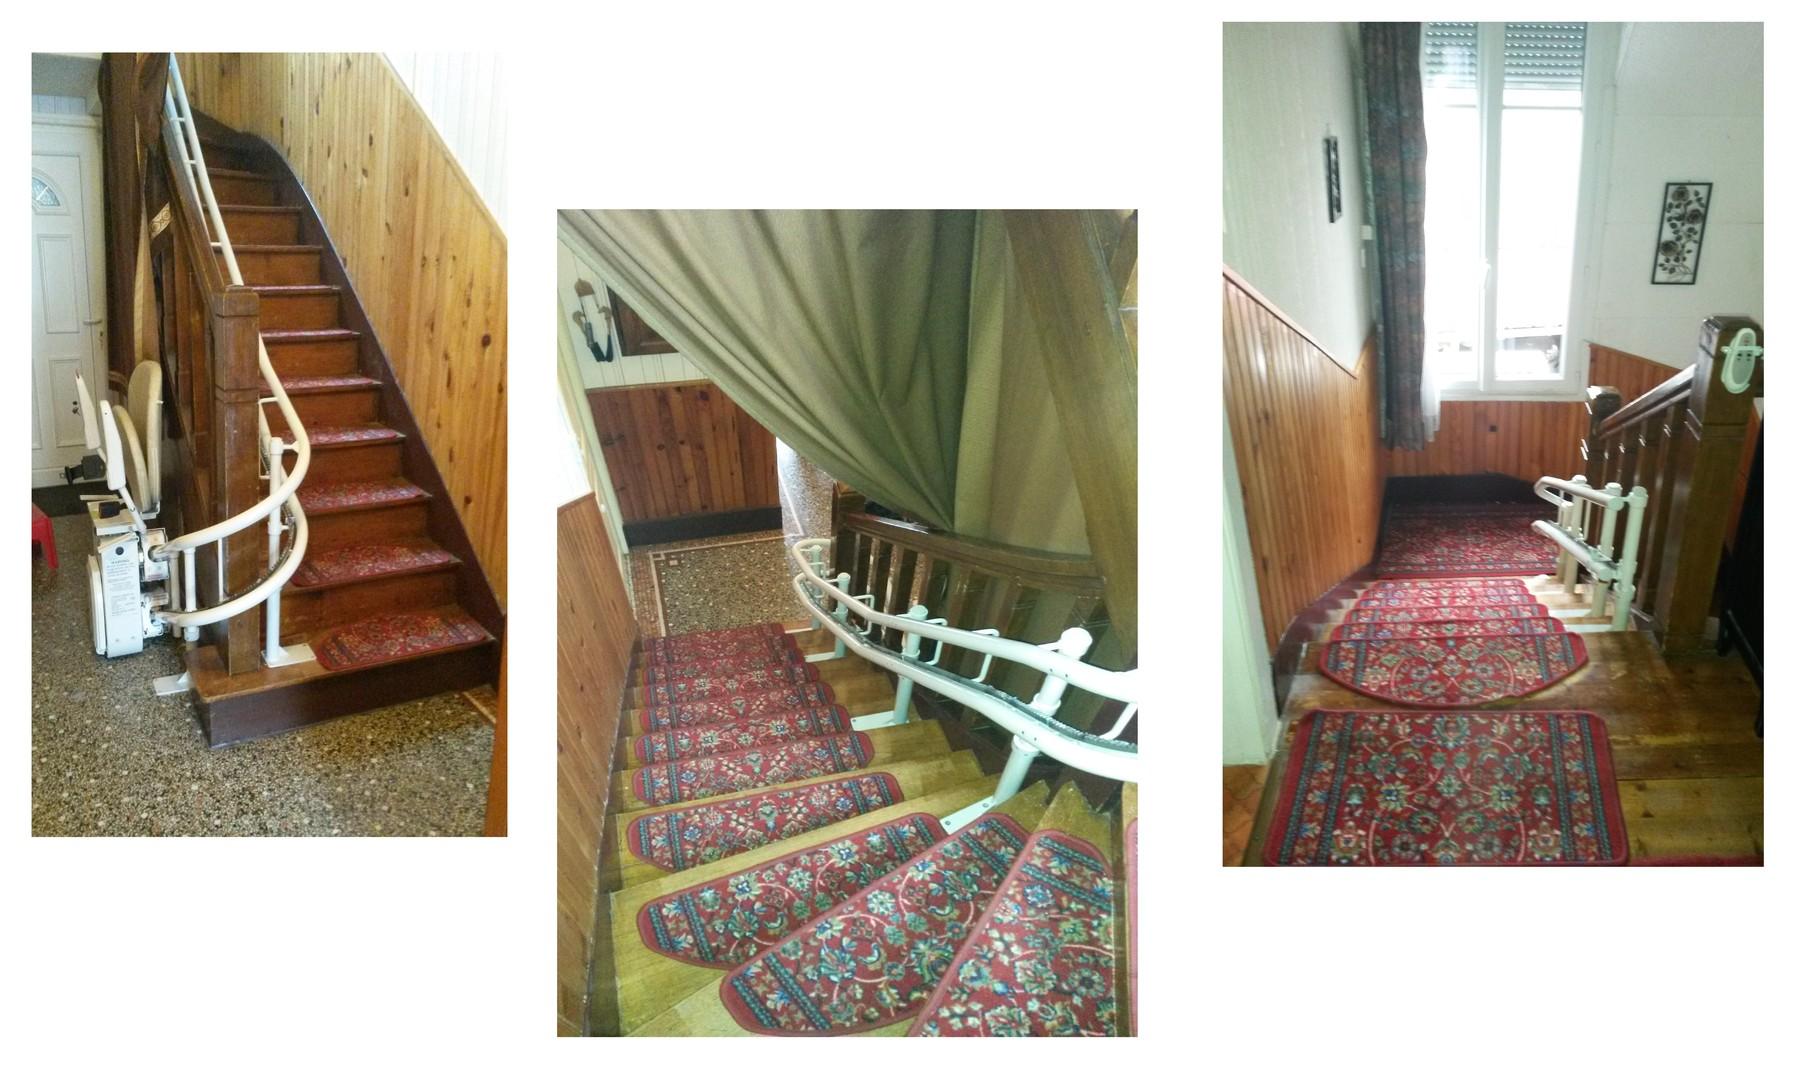 monte escalier tournant sarl auvergne monte escalier. Black Bedroom Furniture Sets. Home Design Ideas